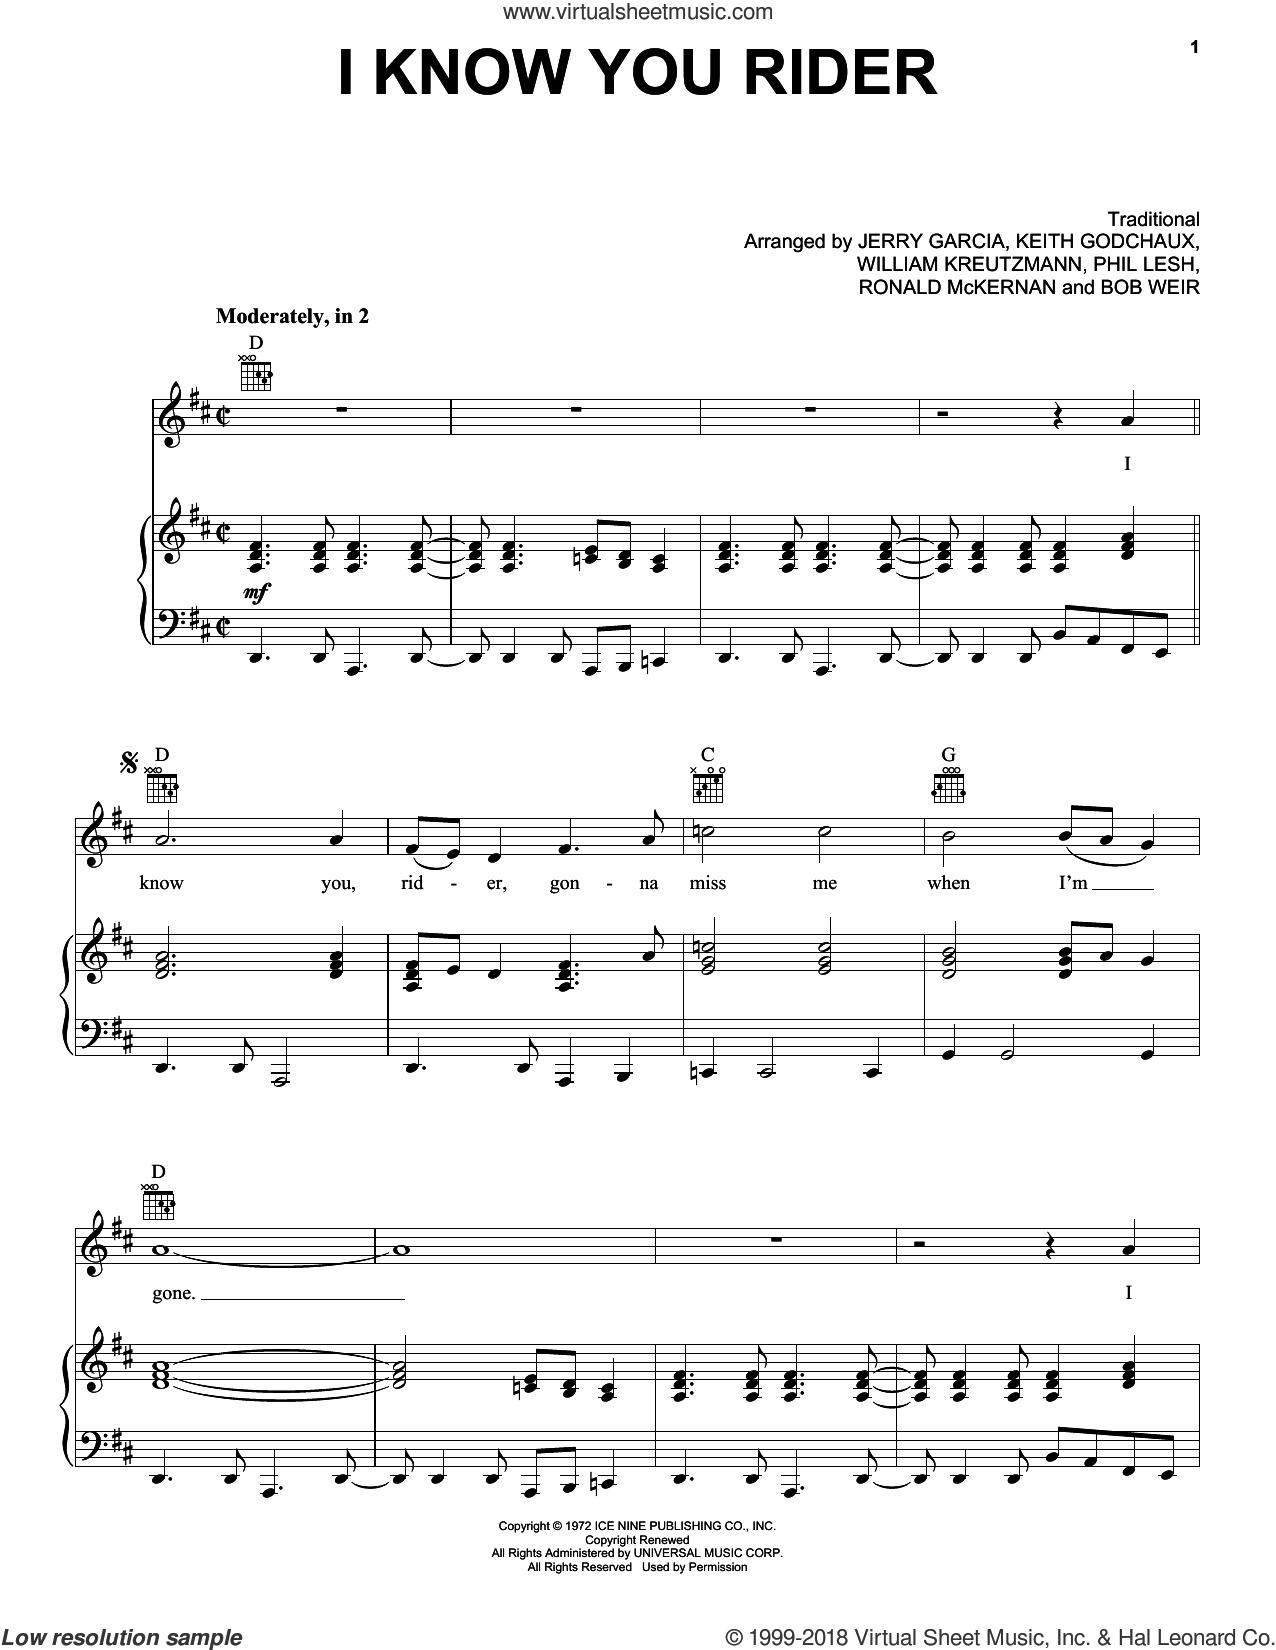 I Know You Rider sheet music for voice, piano or guitar by Grateful Dead, Bob Weir (arr.), Jerry Garcia (arr.), Keith Godchaux (arr.), Miscellaneous, Phil Lesh (arr.), Ronald McKernan (arr.) and William Kreutzmann (arr.), intermediate skill level